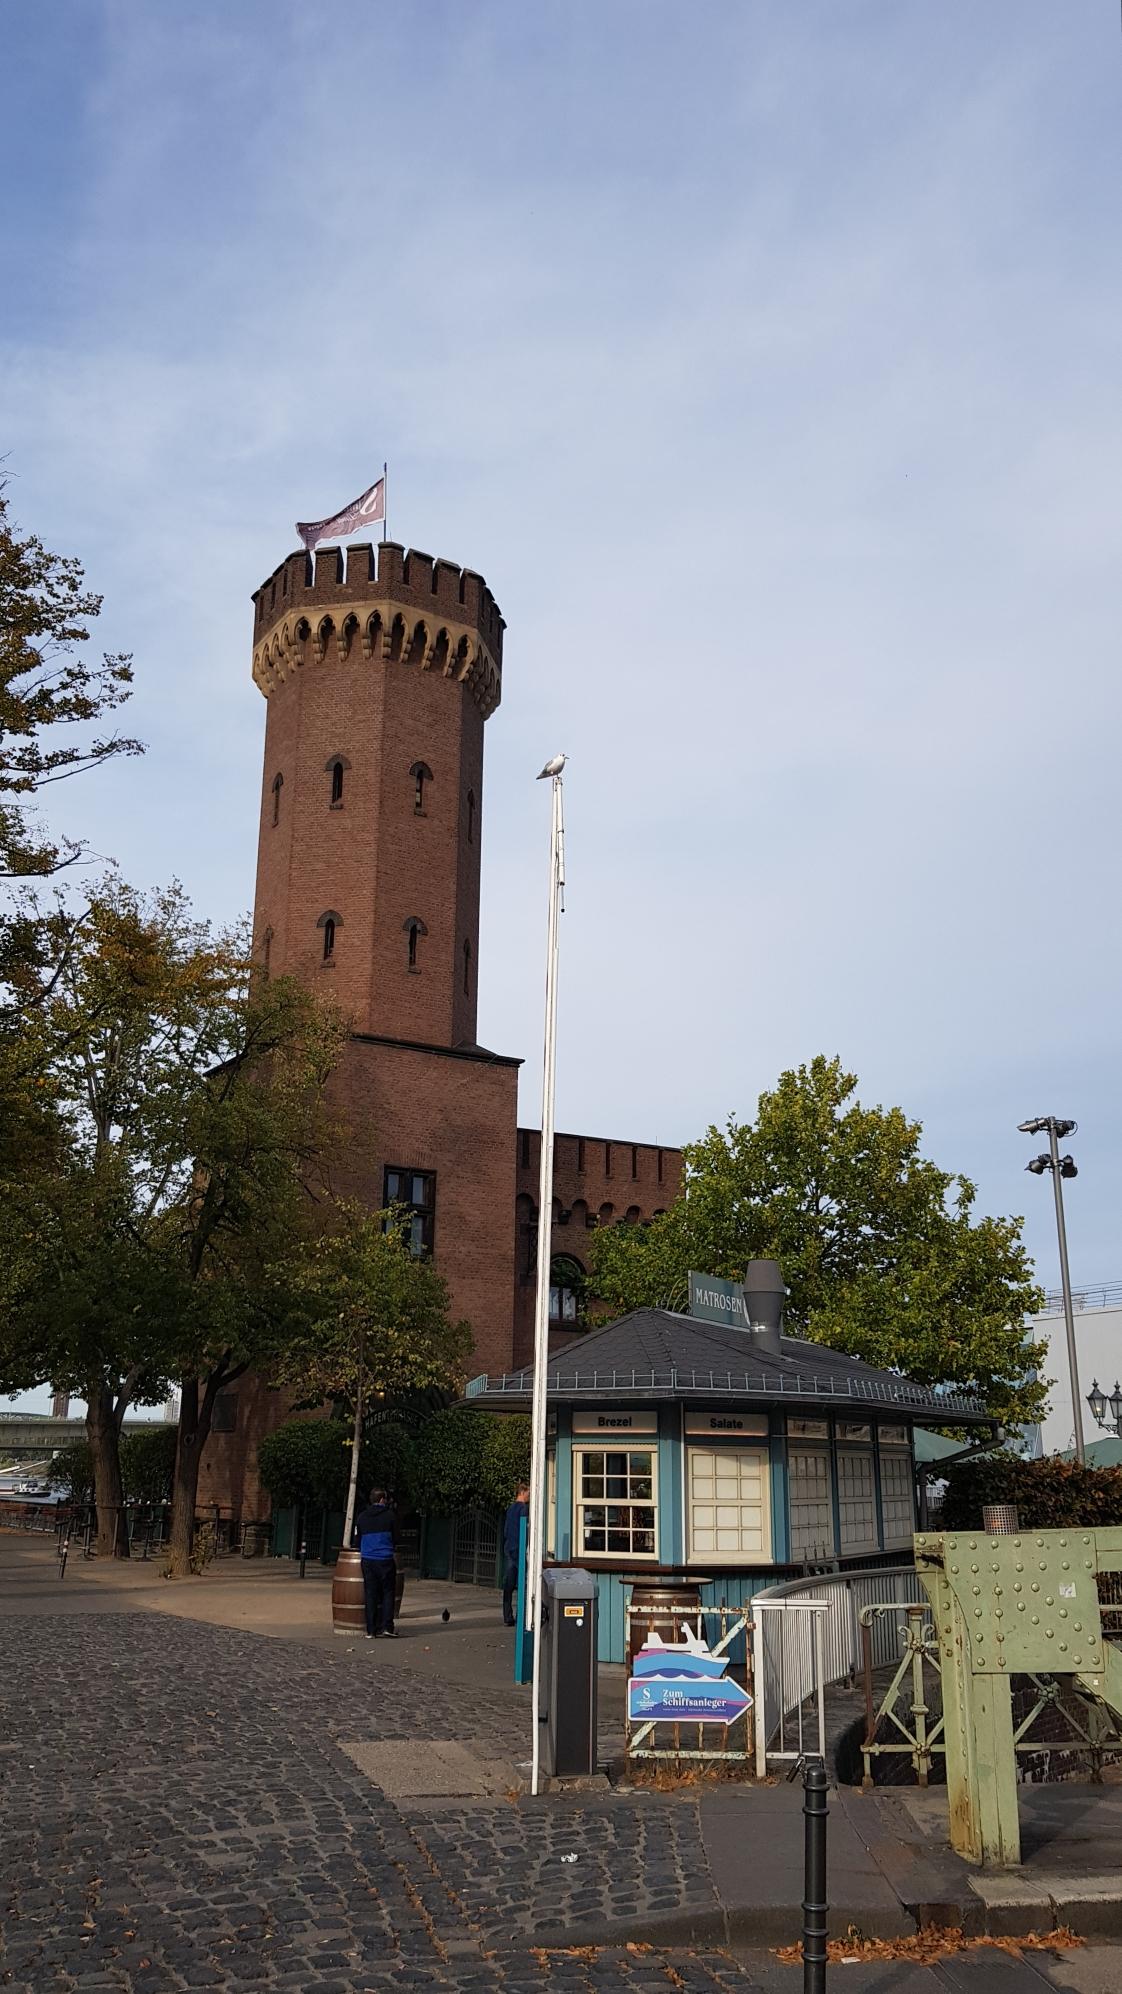 Preußen-Tour - Malakoffturm (1855)